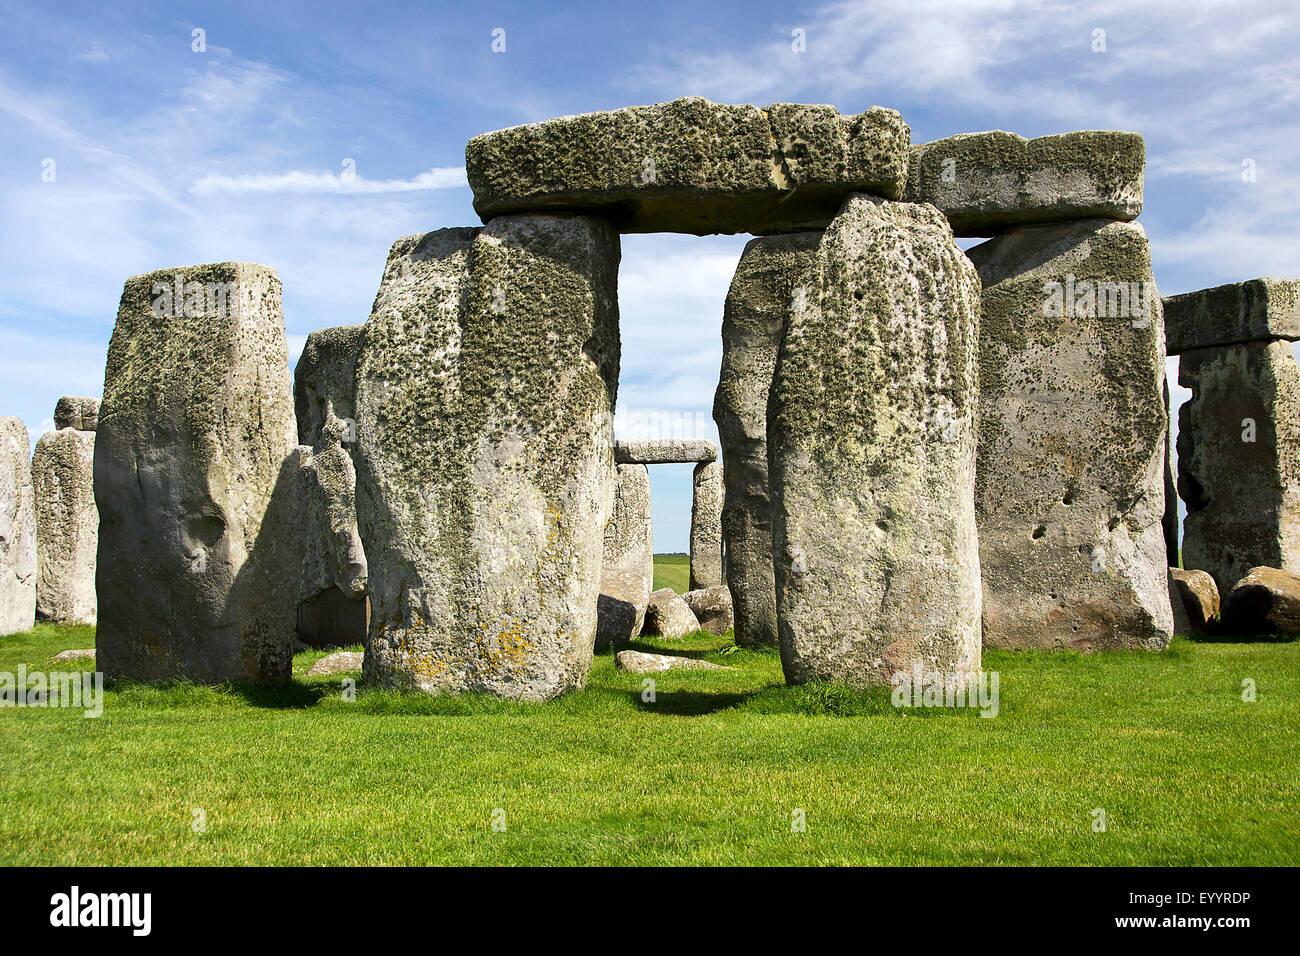 Stonehenge, Wiltshire, Regno Unito, Inghilterra, Stonehenge Immagini Stock